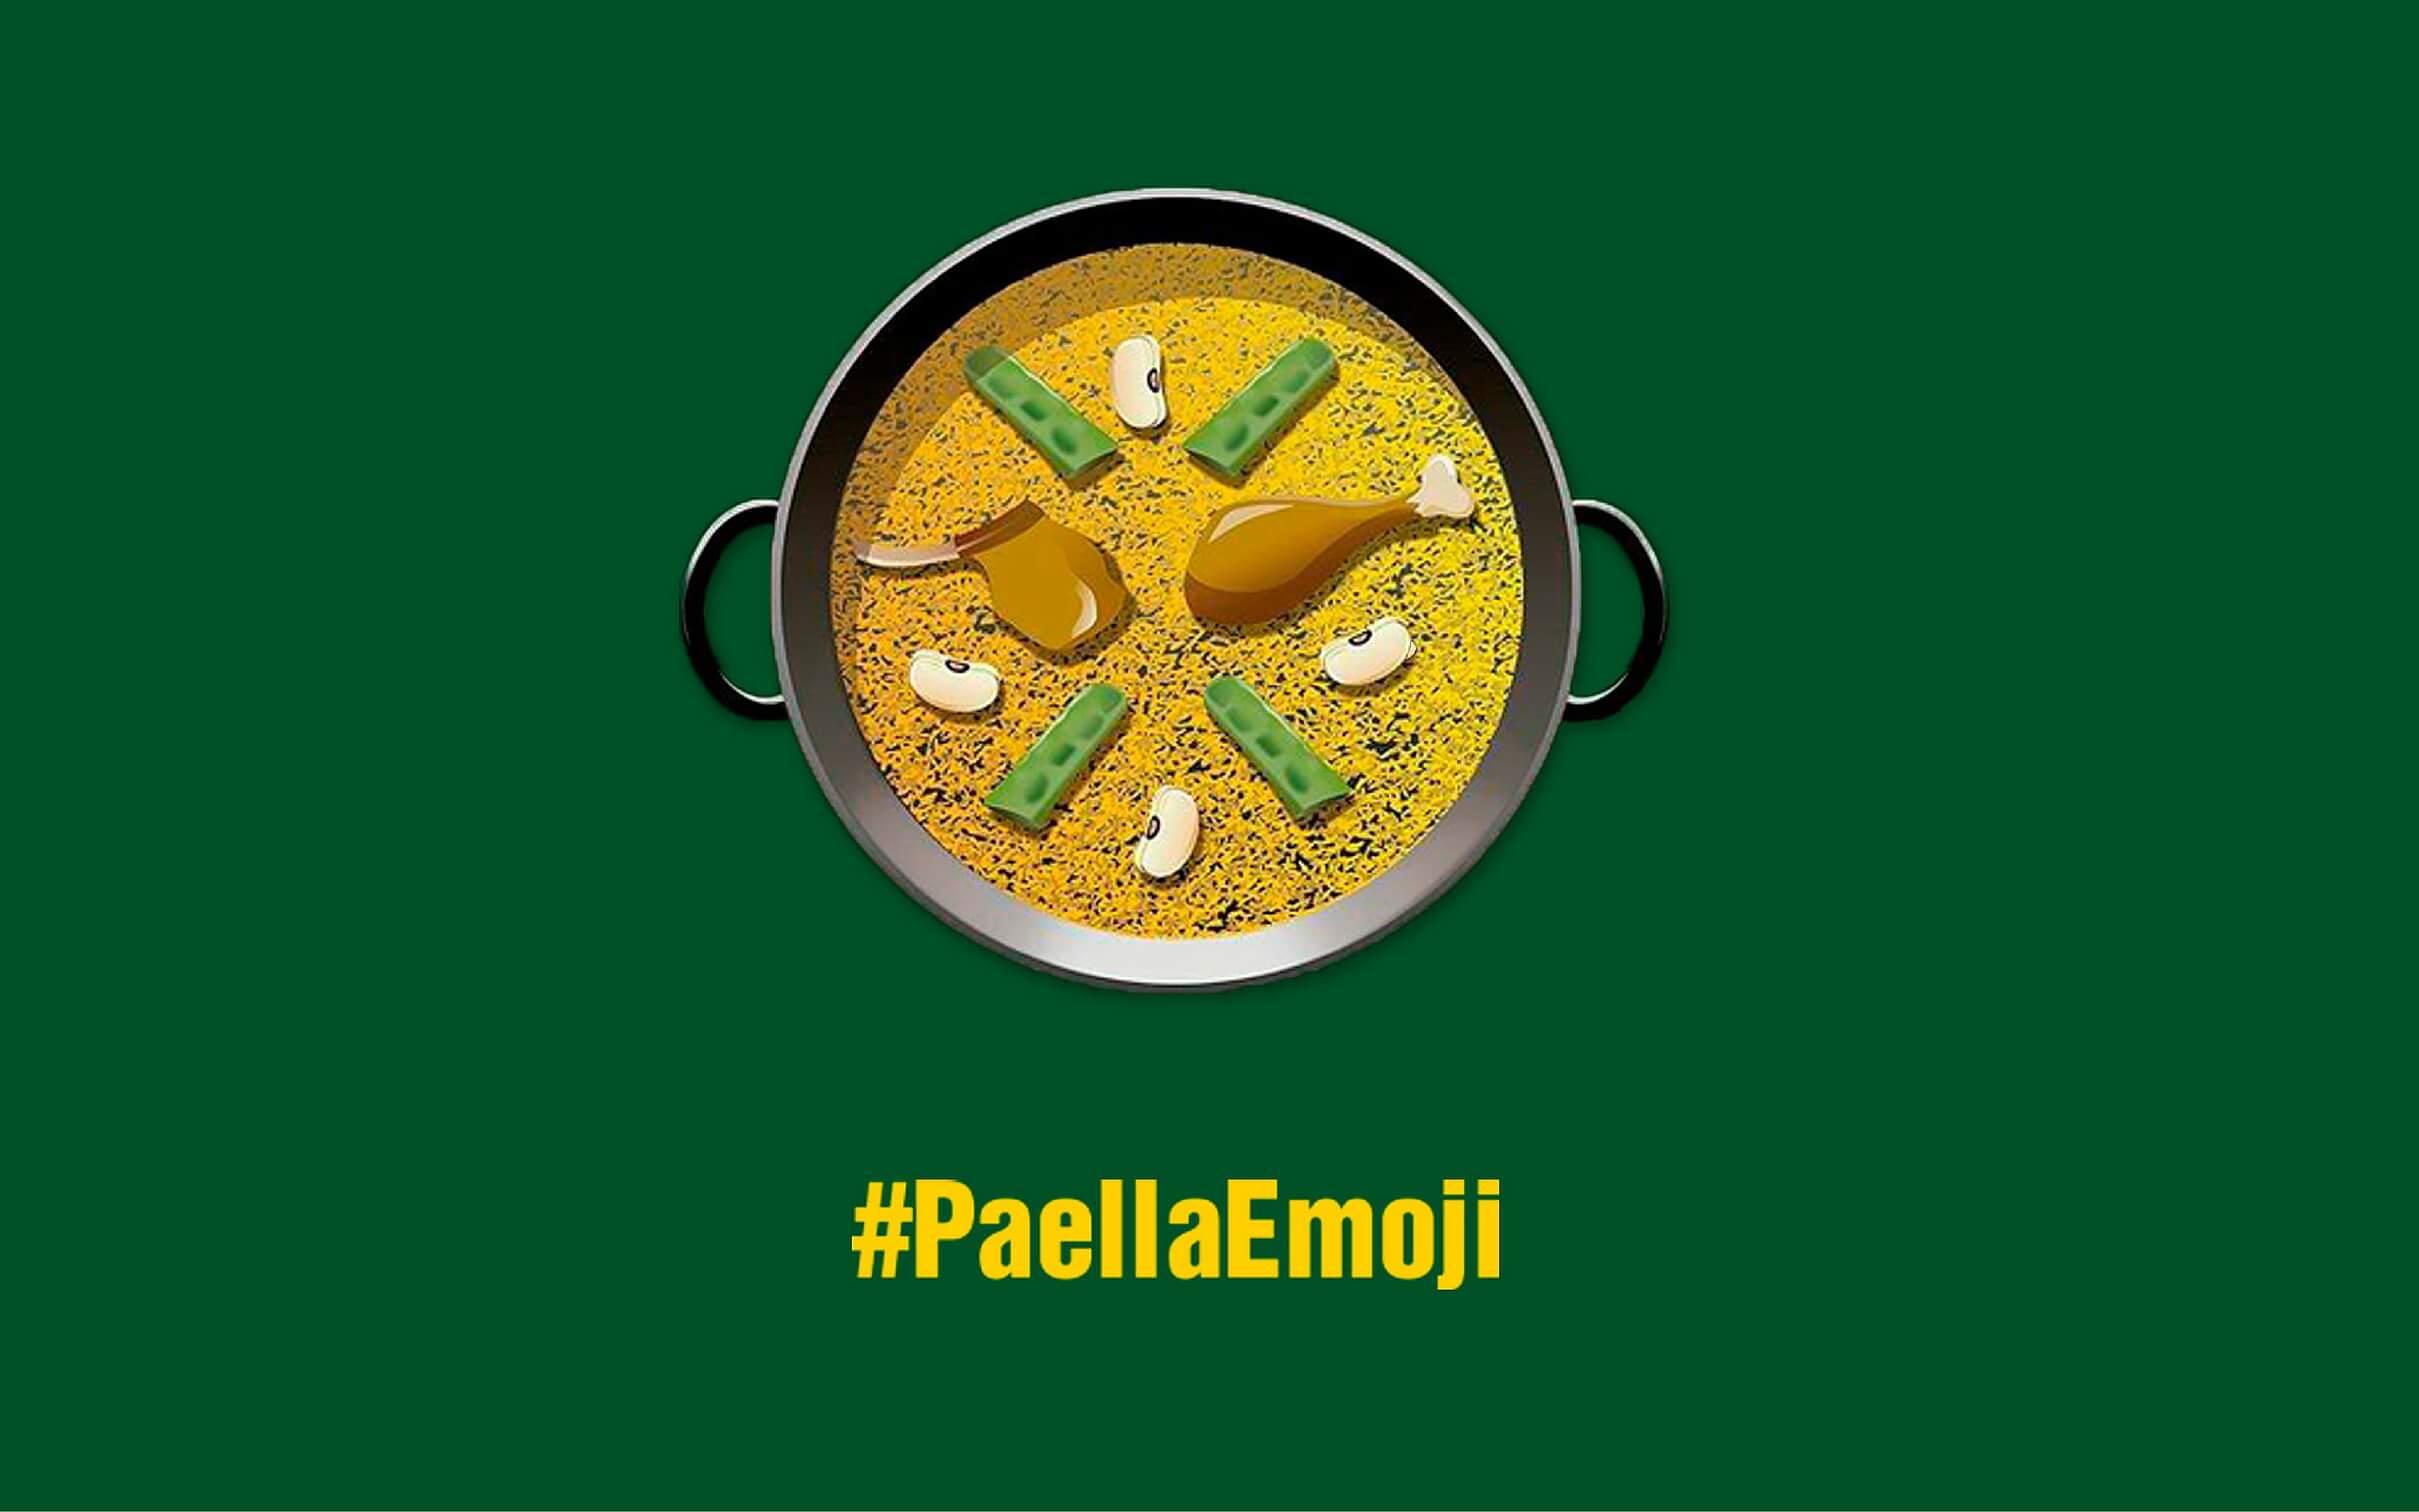 Social Paella emoji